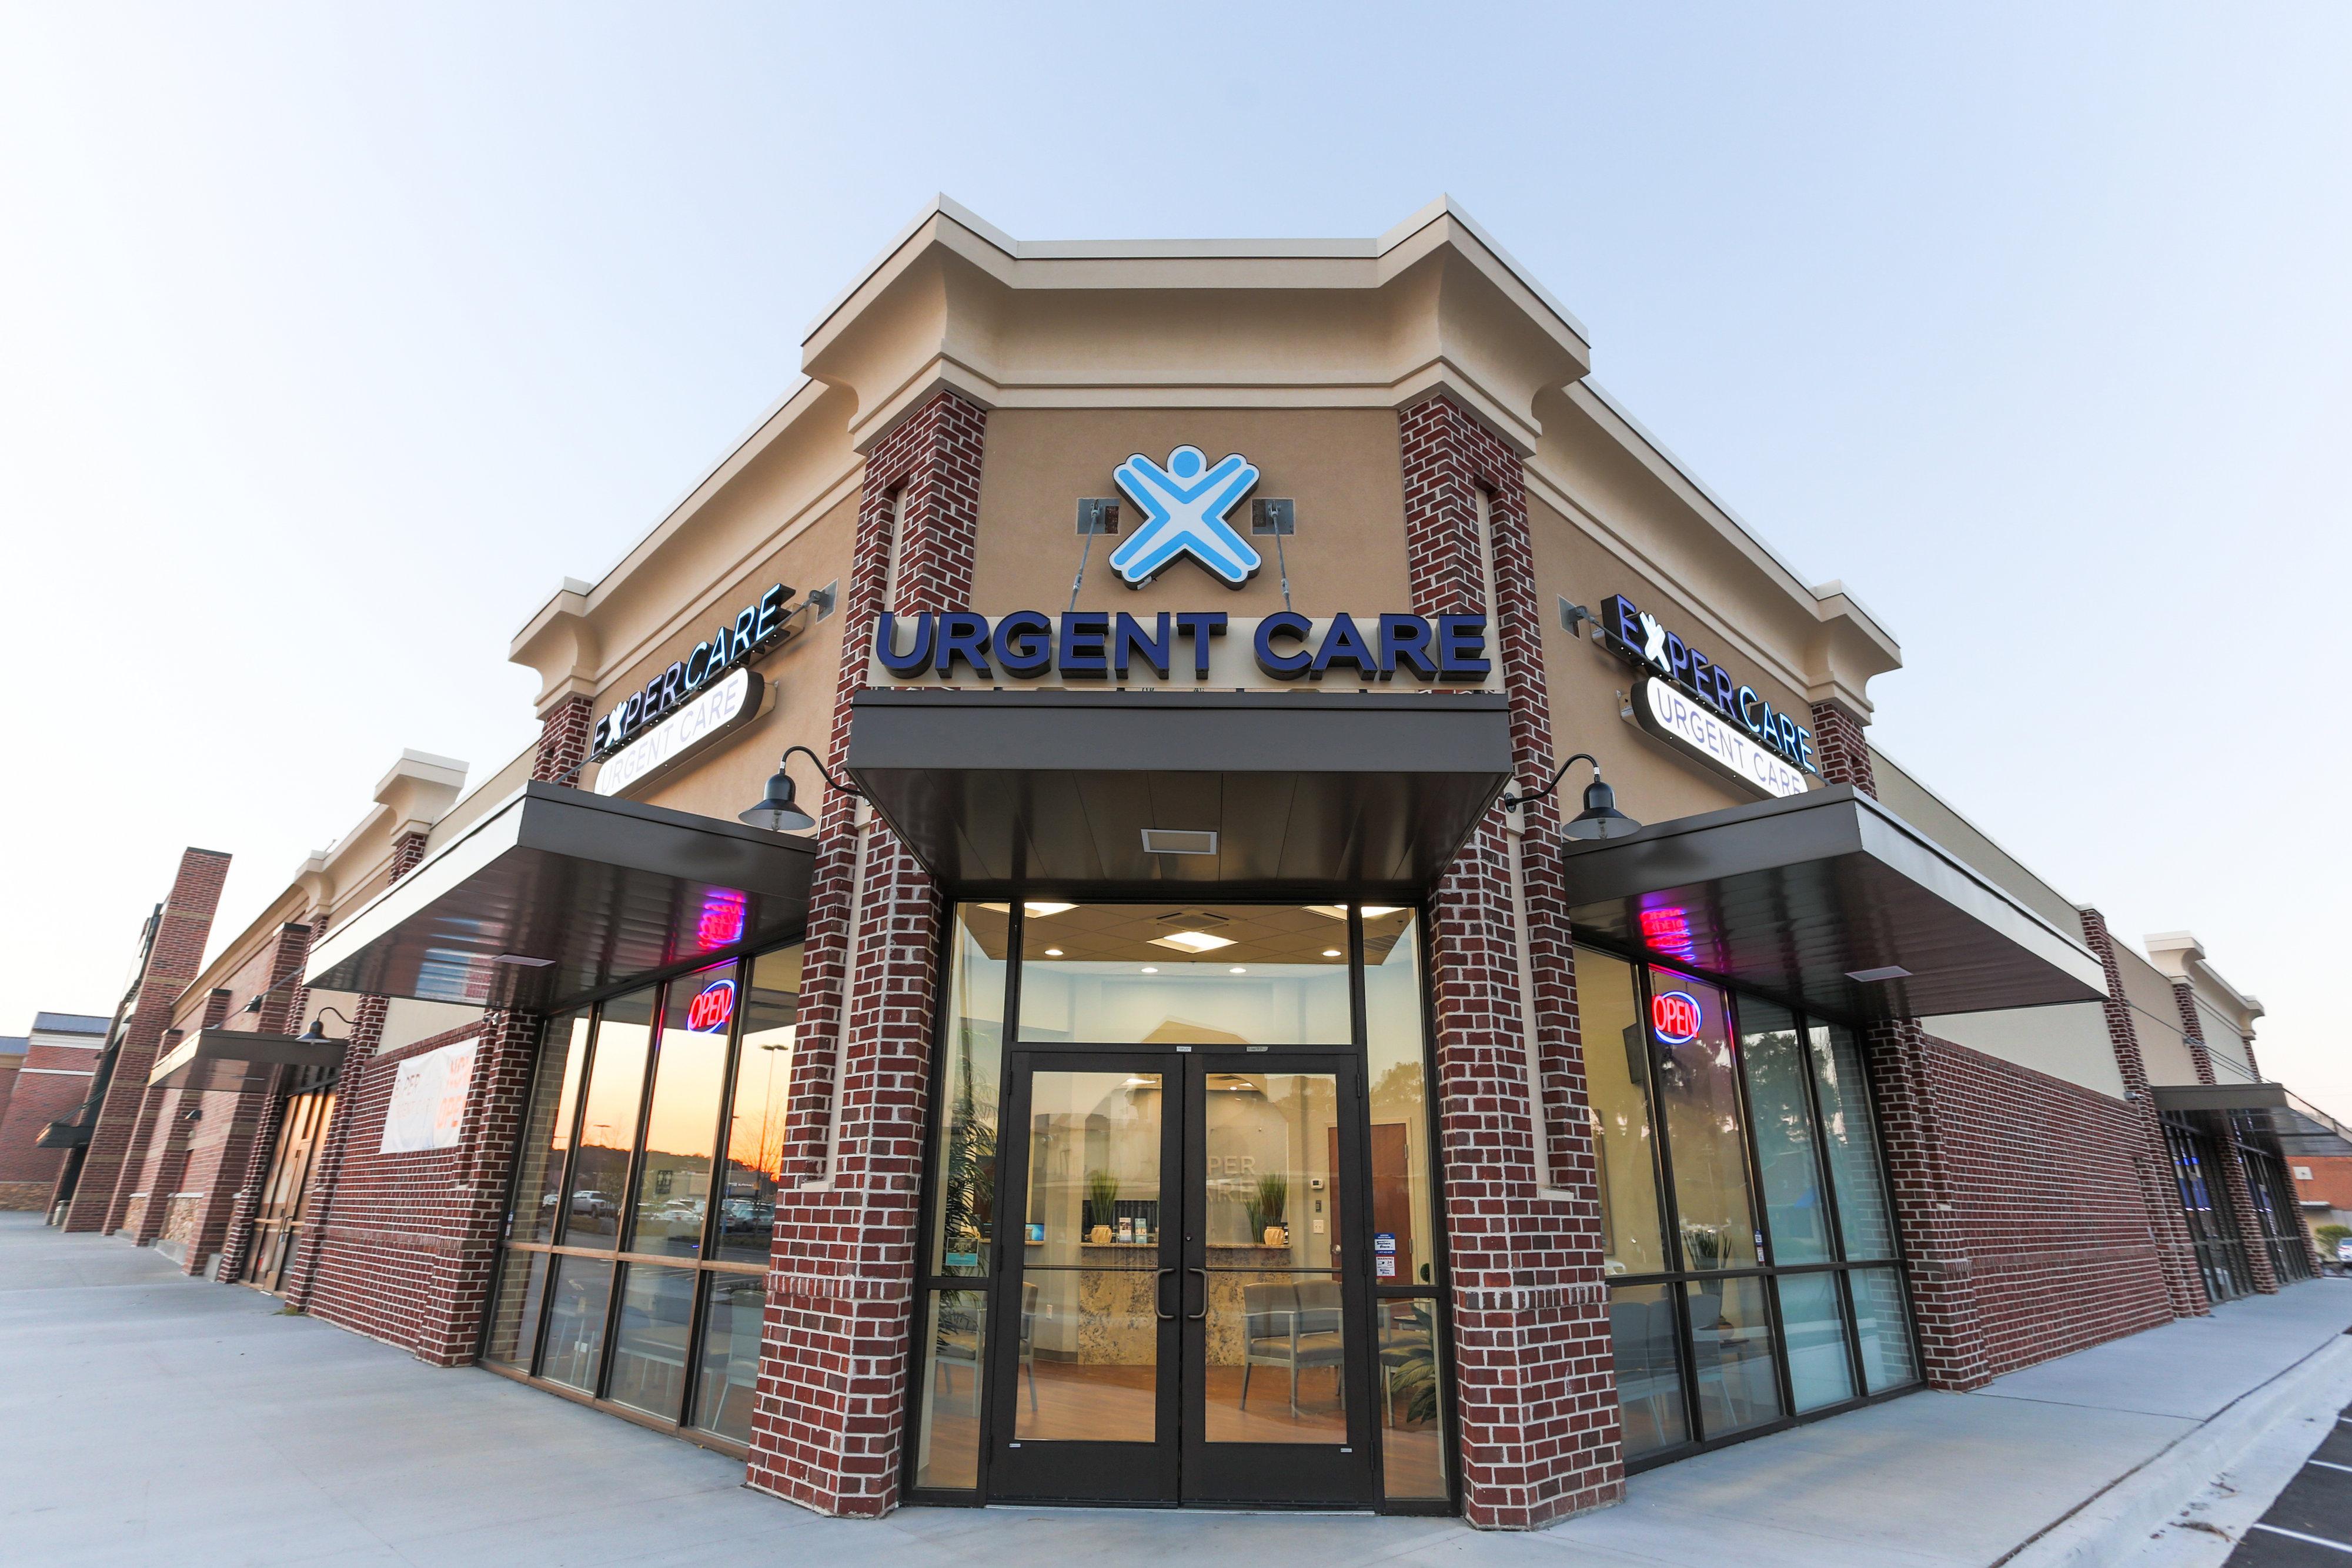 ExperCARE - Savannah - Urgent Care Solv in Savannah, GA